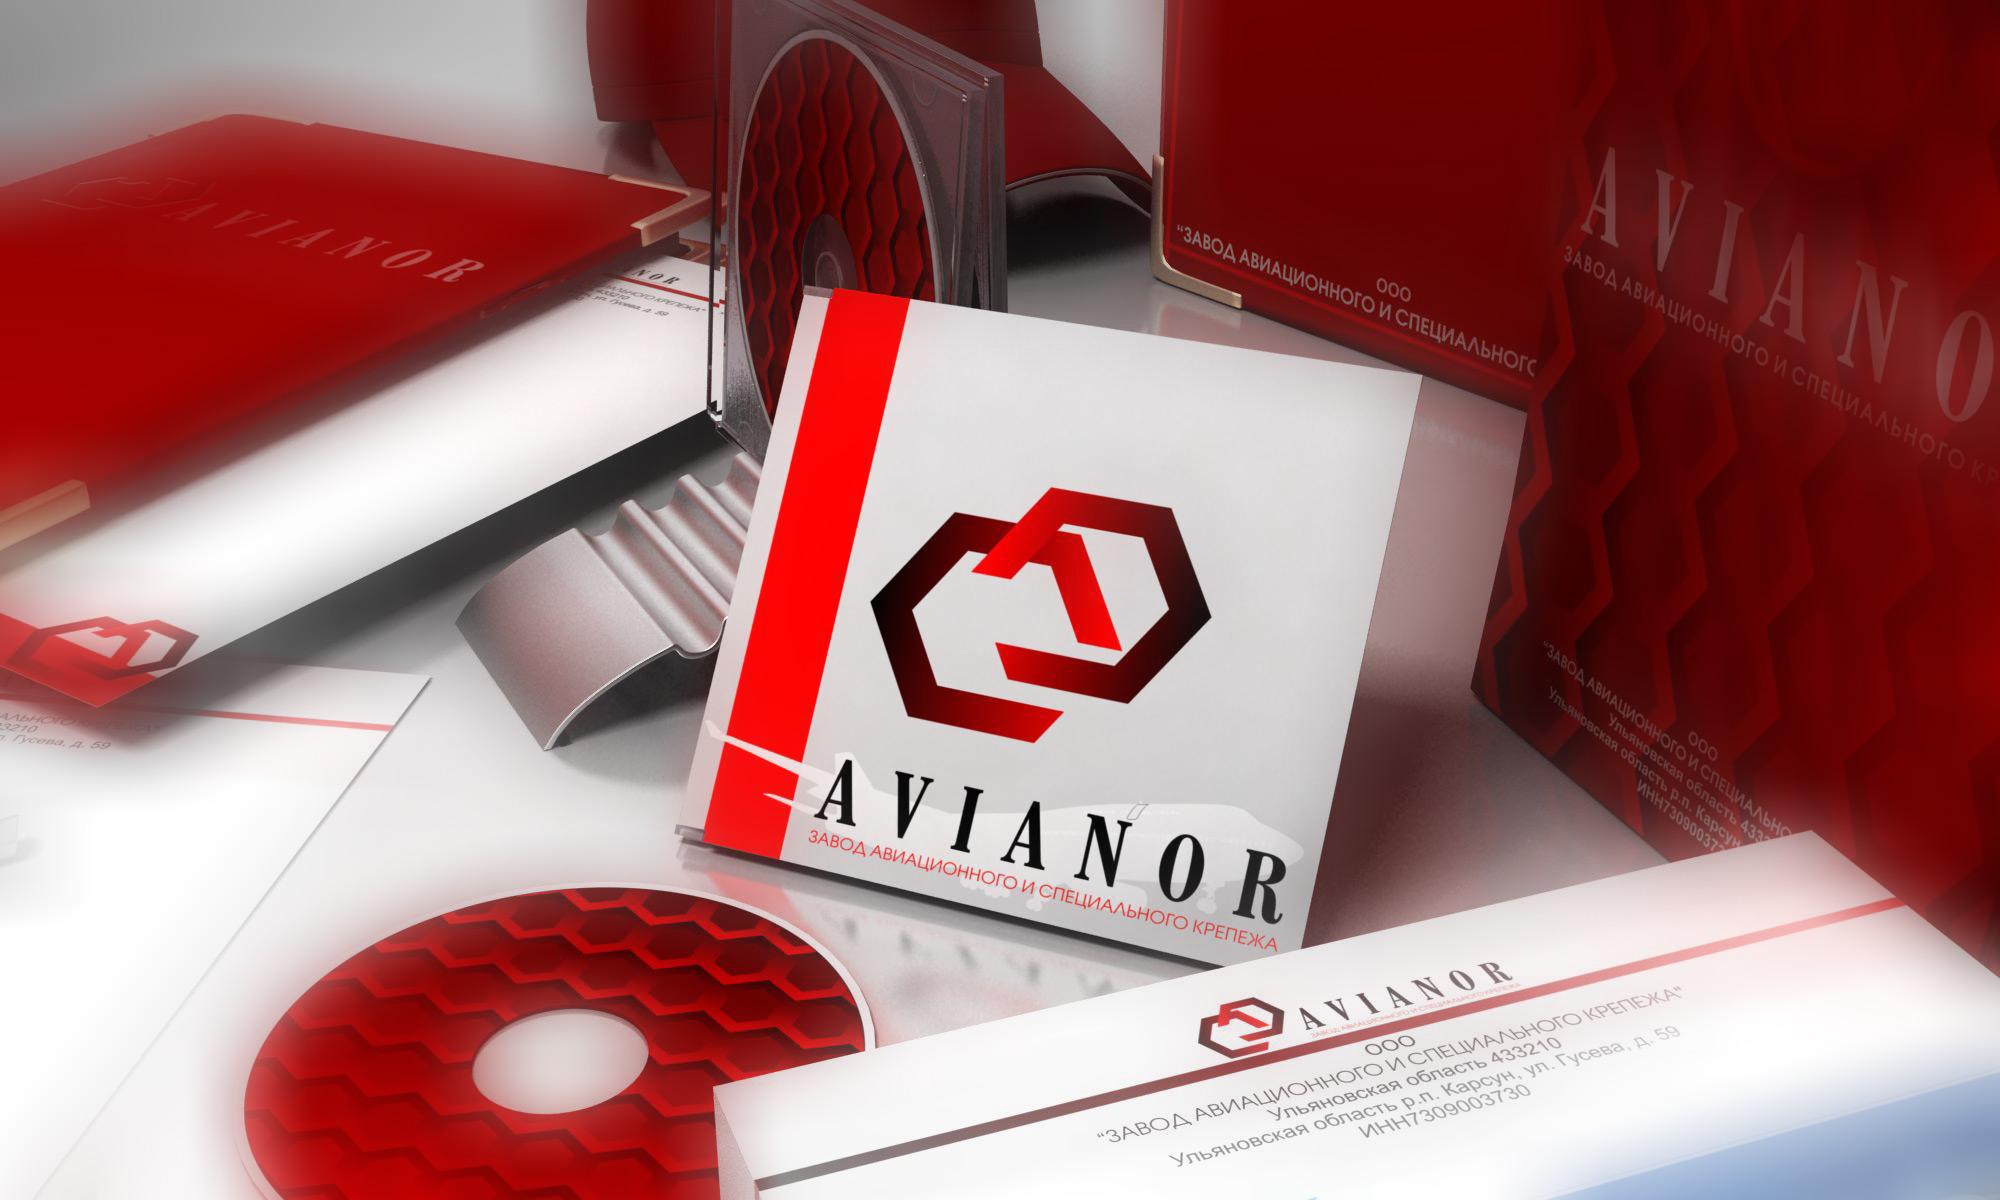 Нужен логотип и фирменный стиль для завода фото f_39452984588a833b.jpg